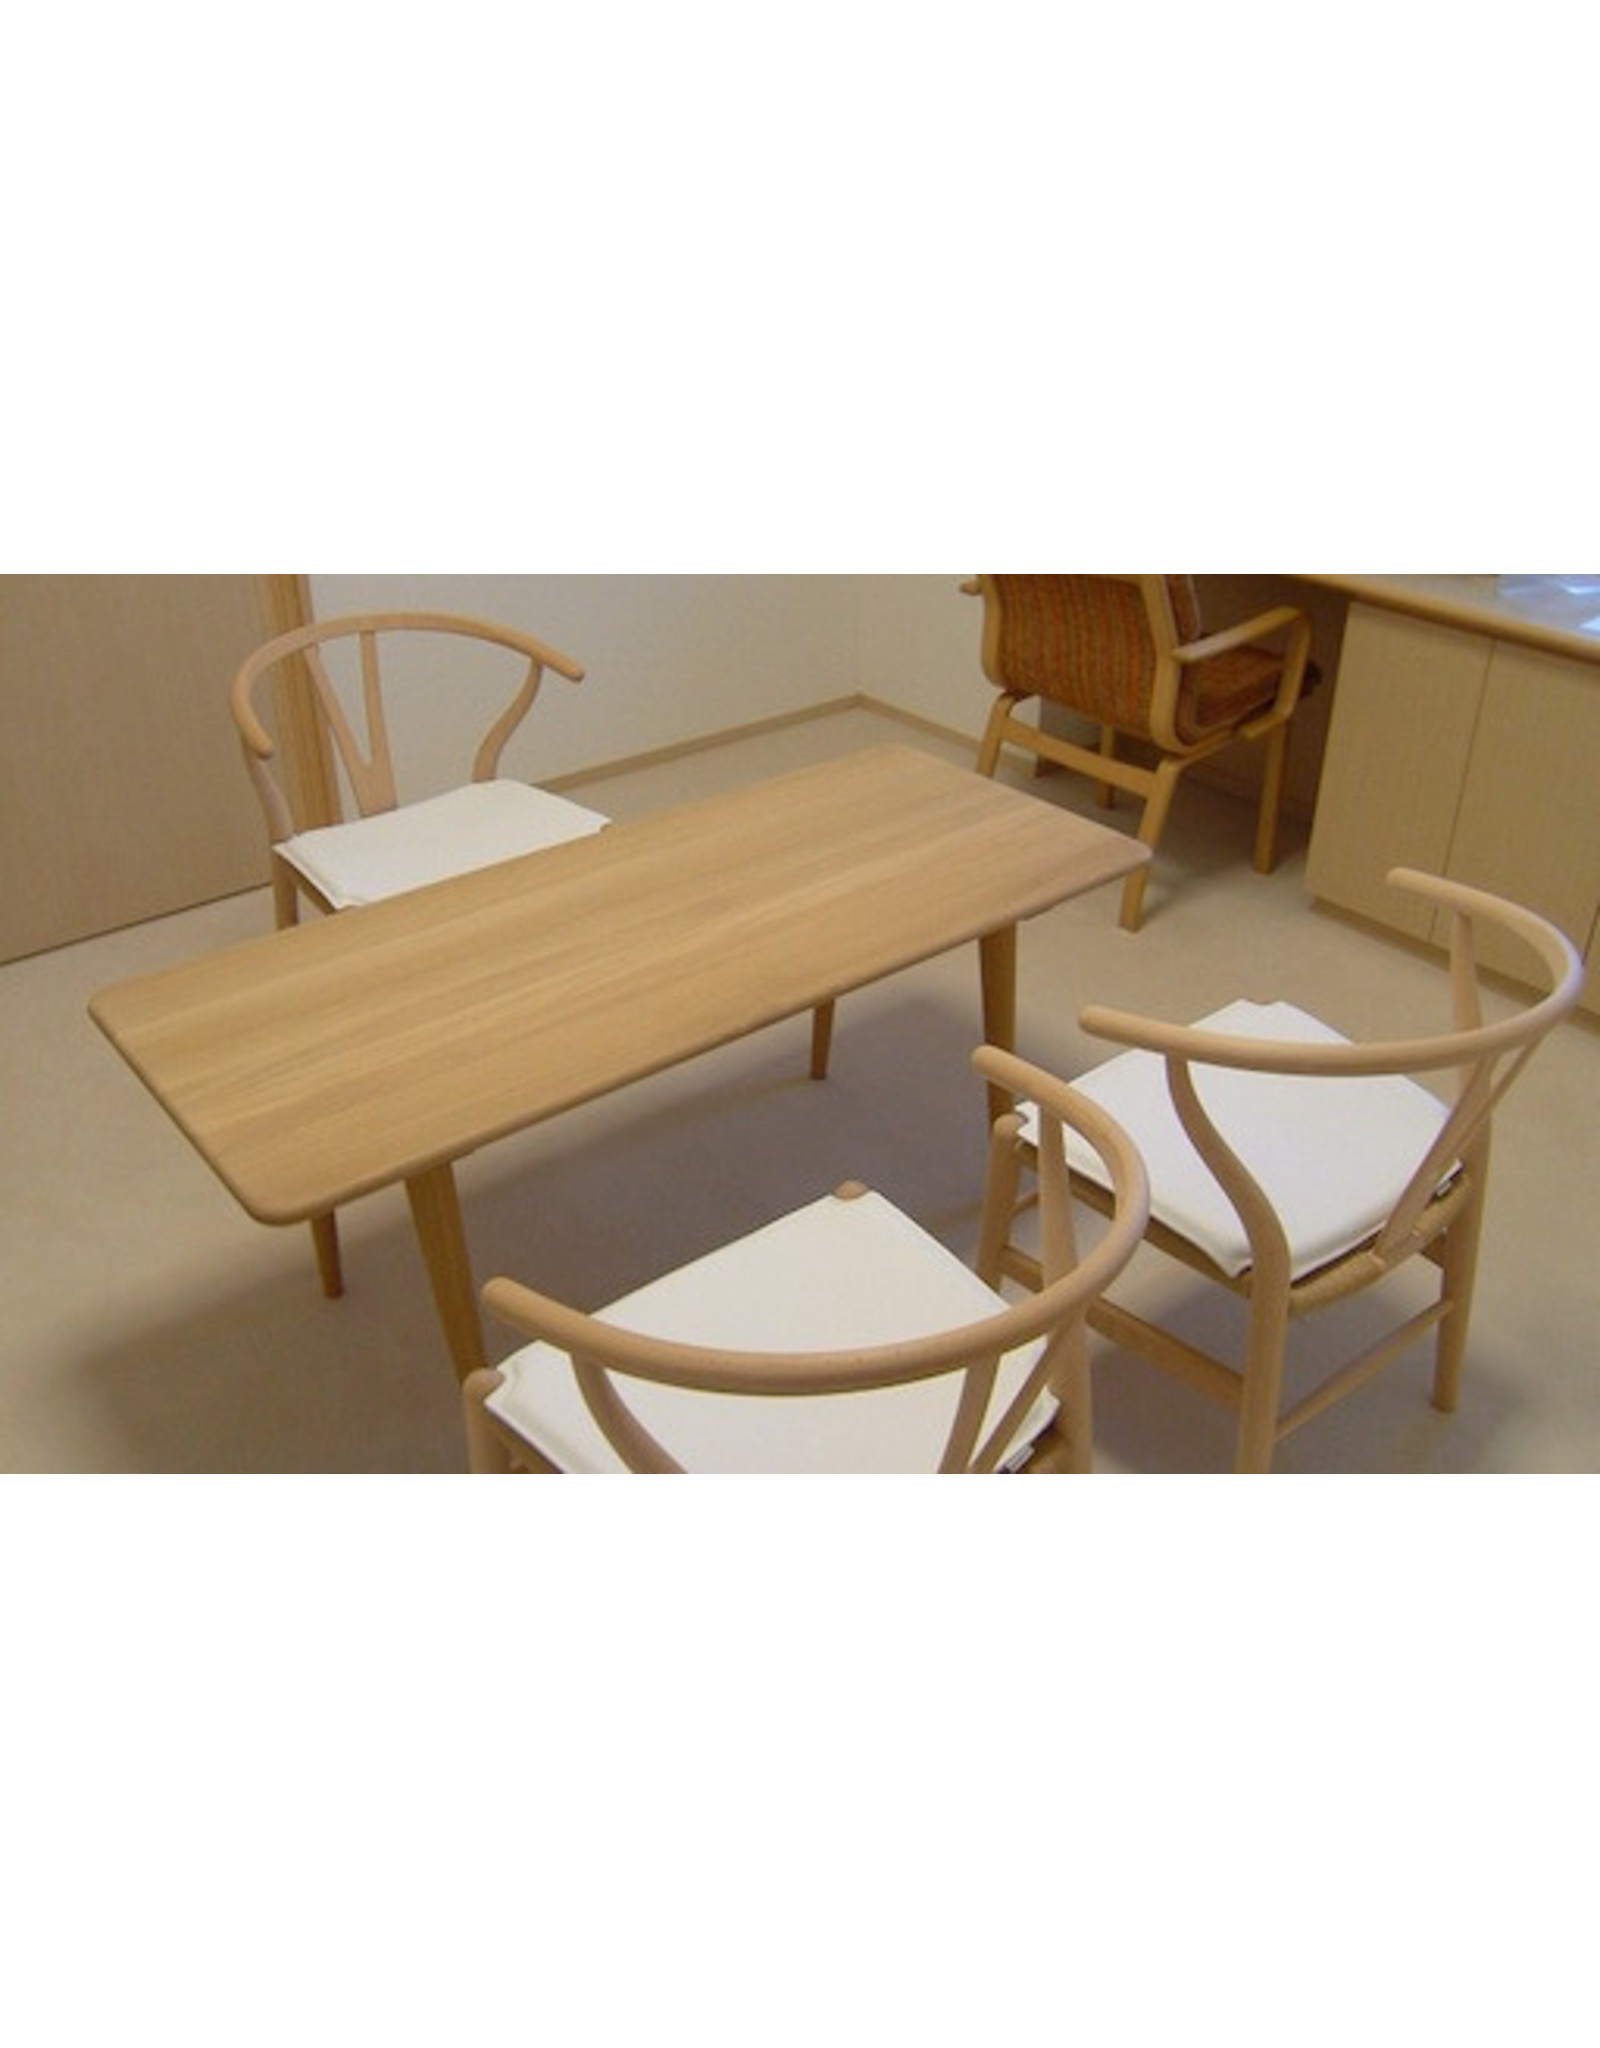 CH011 COFFEE TABLE IN SOLID OAK